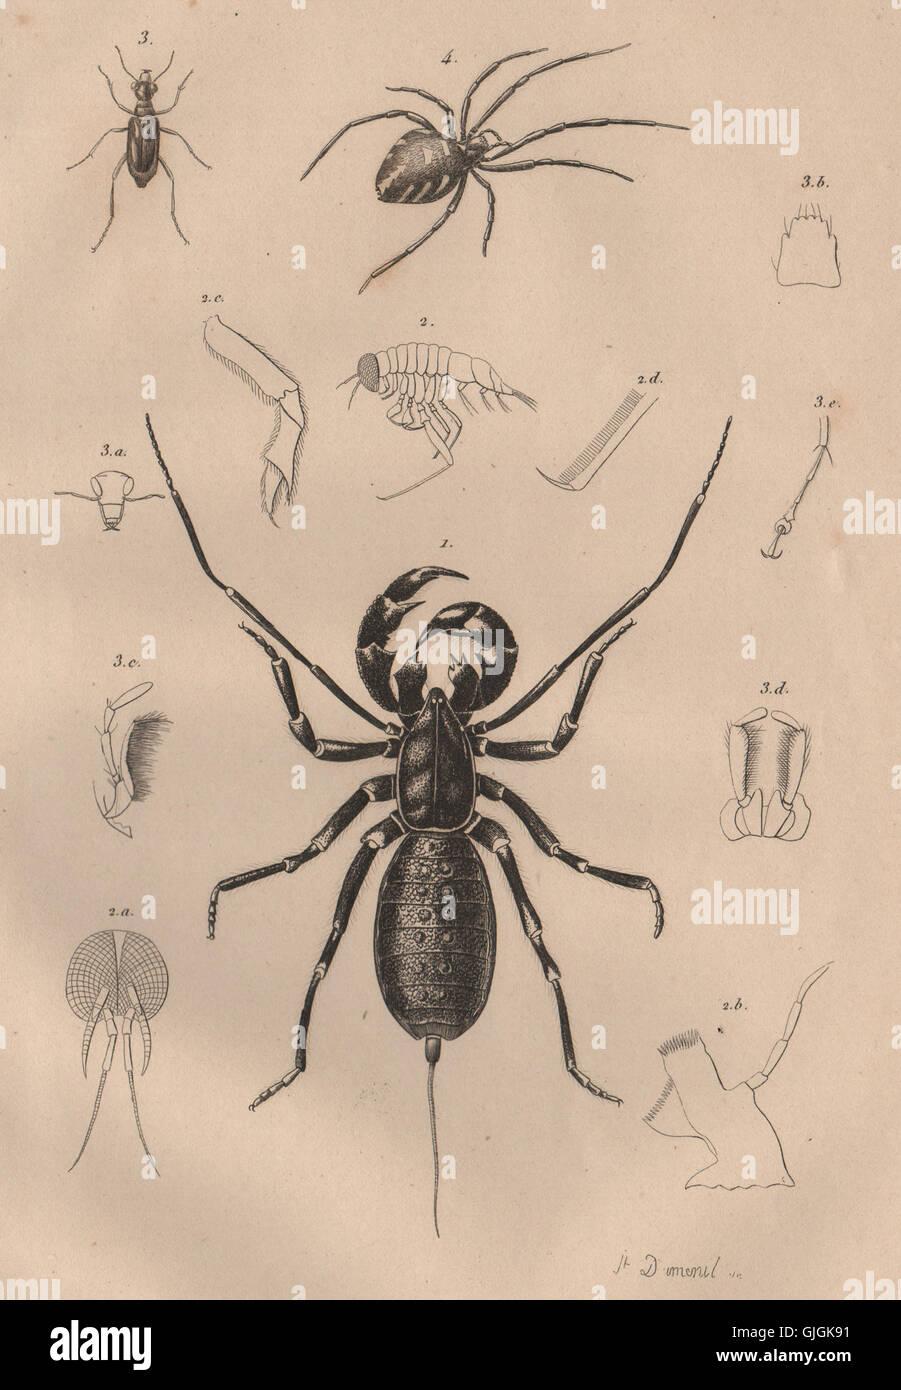 SPIDERS: Thelyphonida (Vinegaroon). Theridion (Black Widow Spider).Theratus 1834 - Stock Image